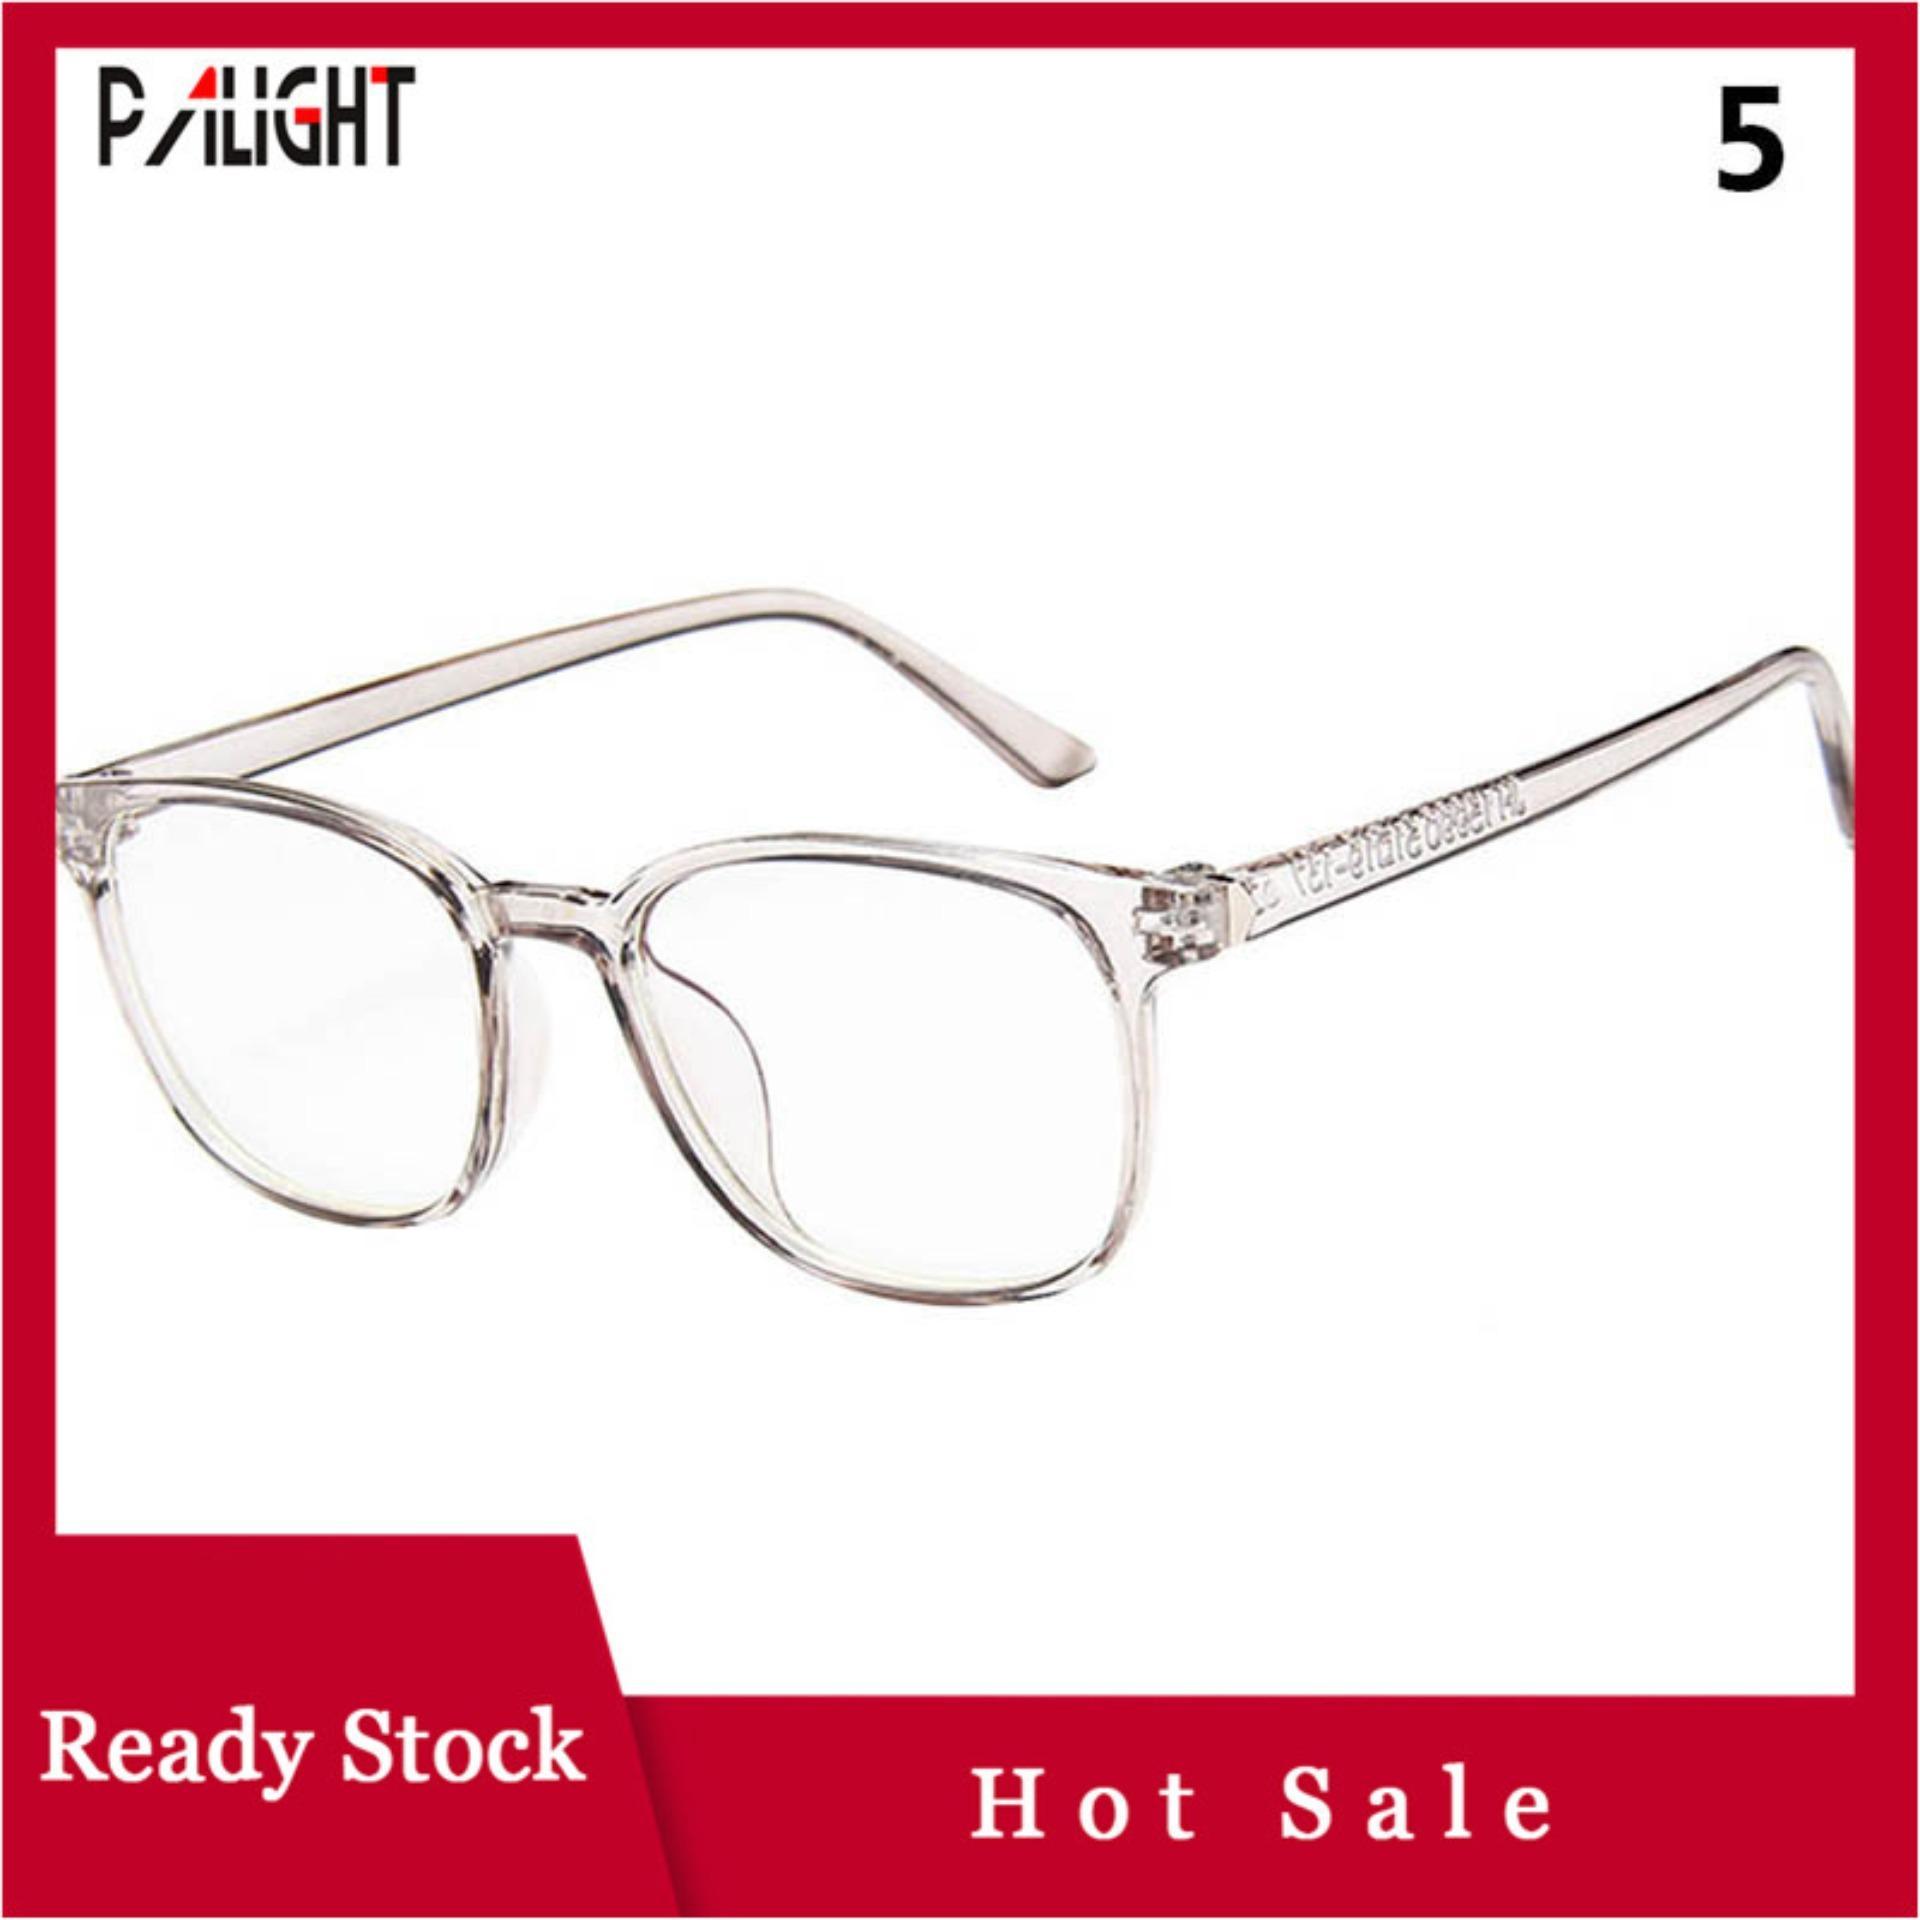 544dc0bb03 PAlight 1 Pcs Women Vintage Glasses Clear Lens Eyewears Radiation Protection  Dustproof For Unisex